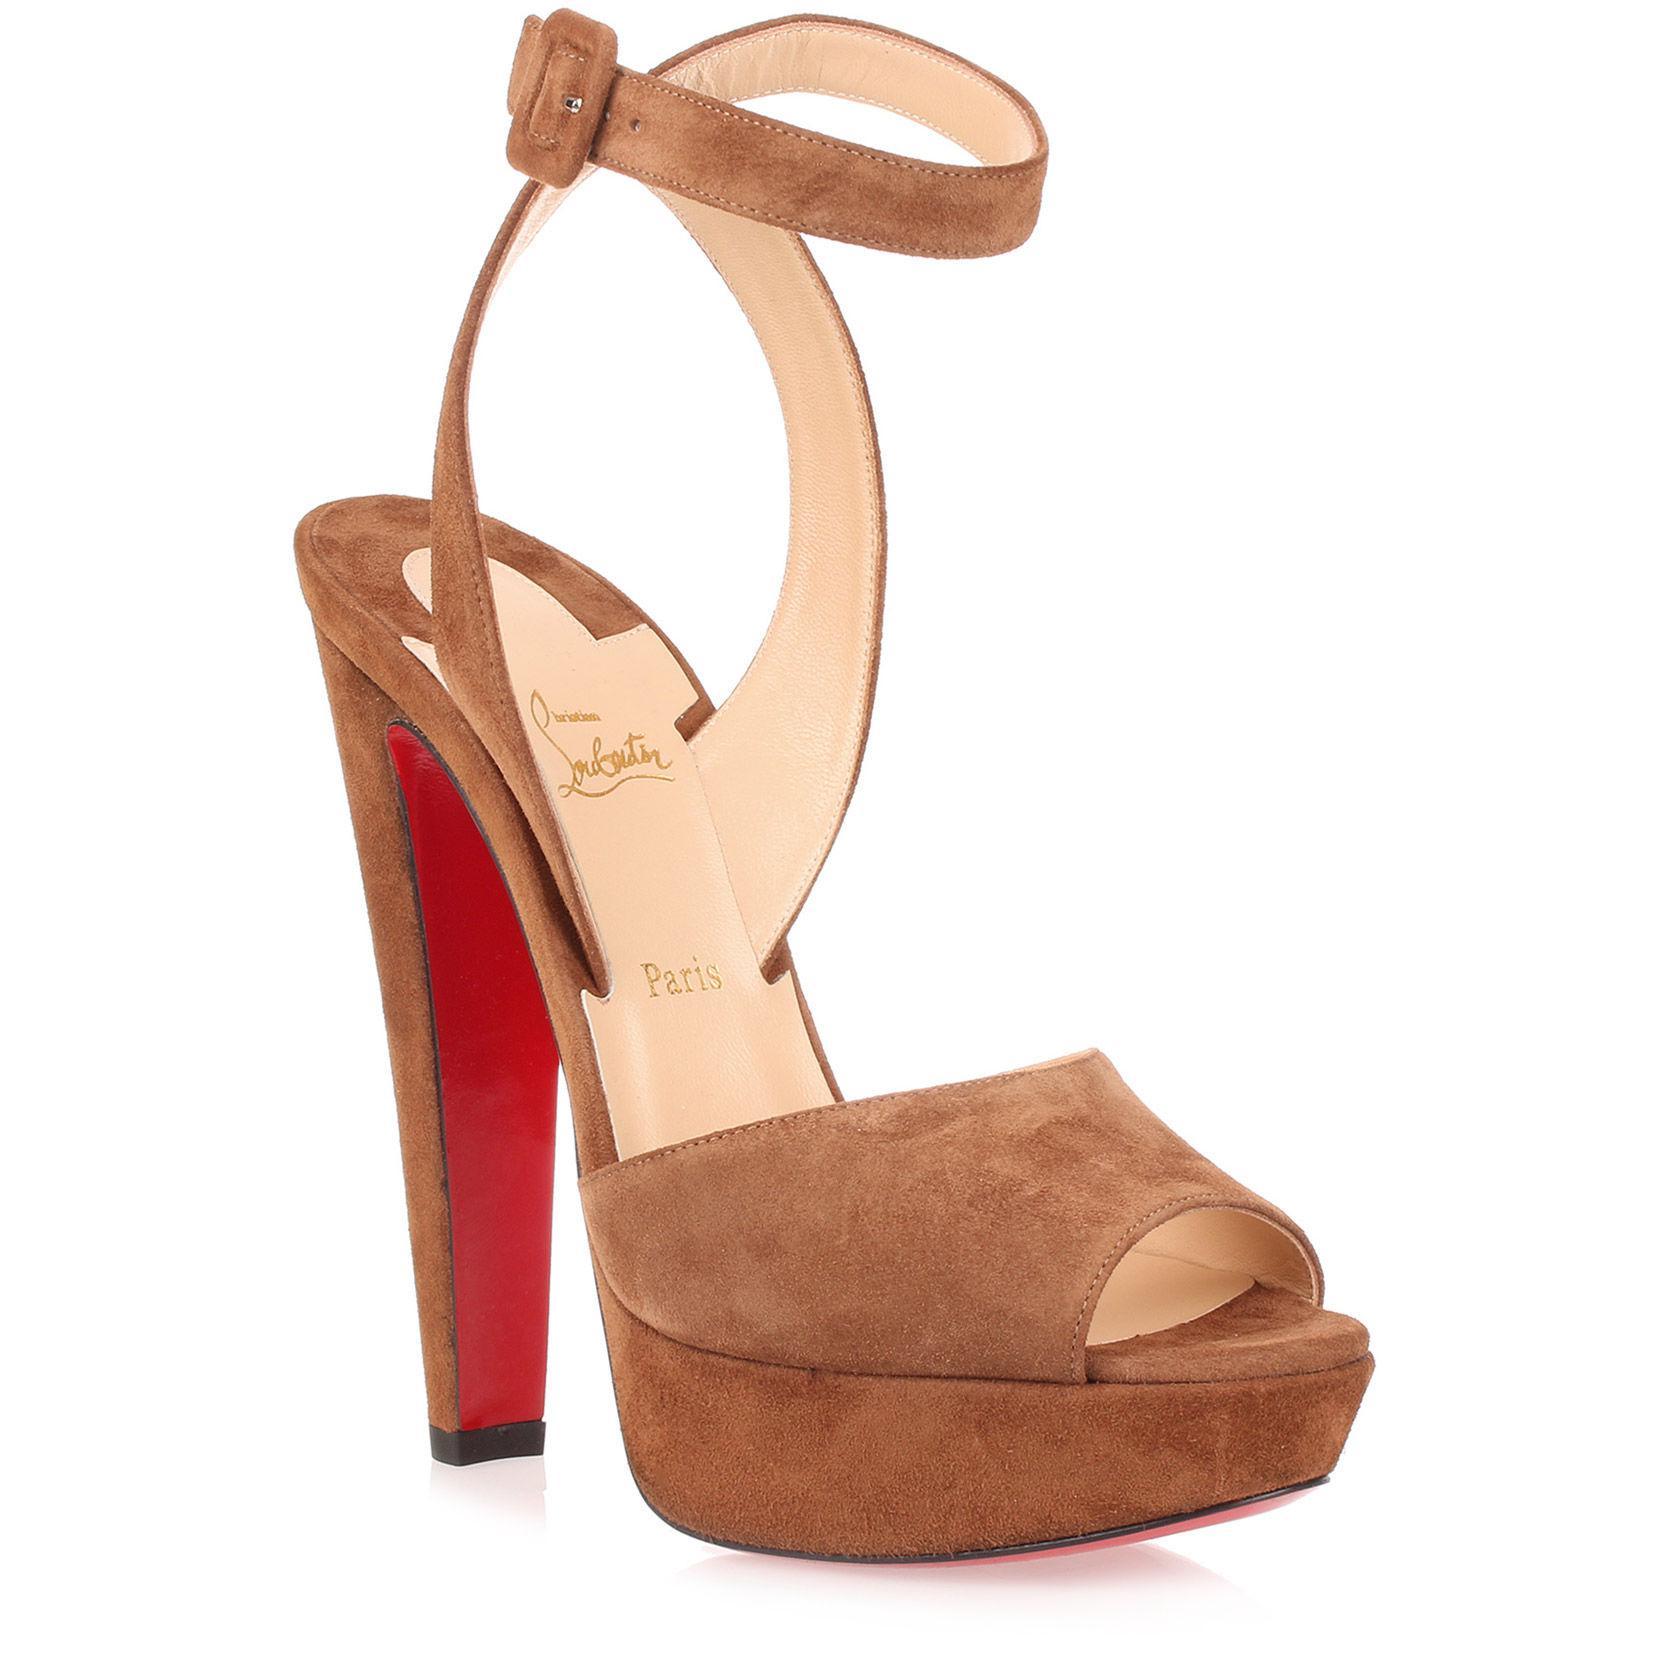 2a3e231e7eb Christian Louboutin. Women s Brown Louloudancing 140 Tan Suede Sandal Us